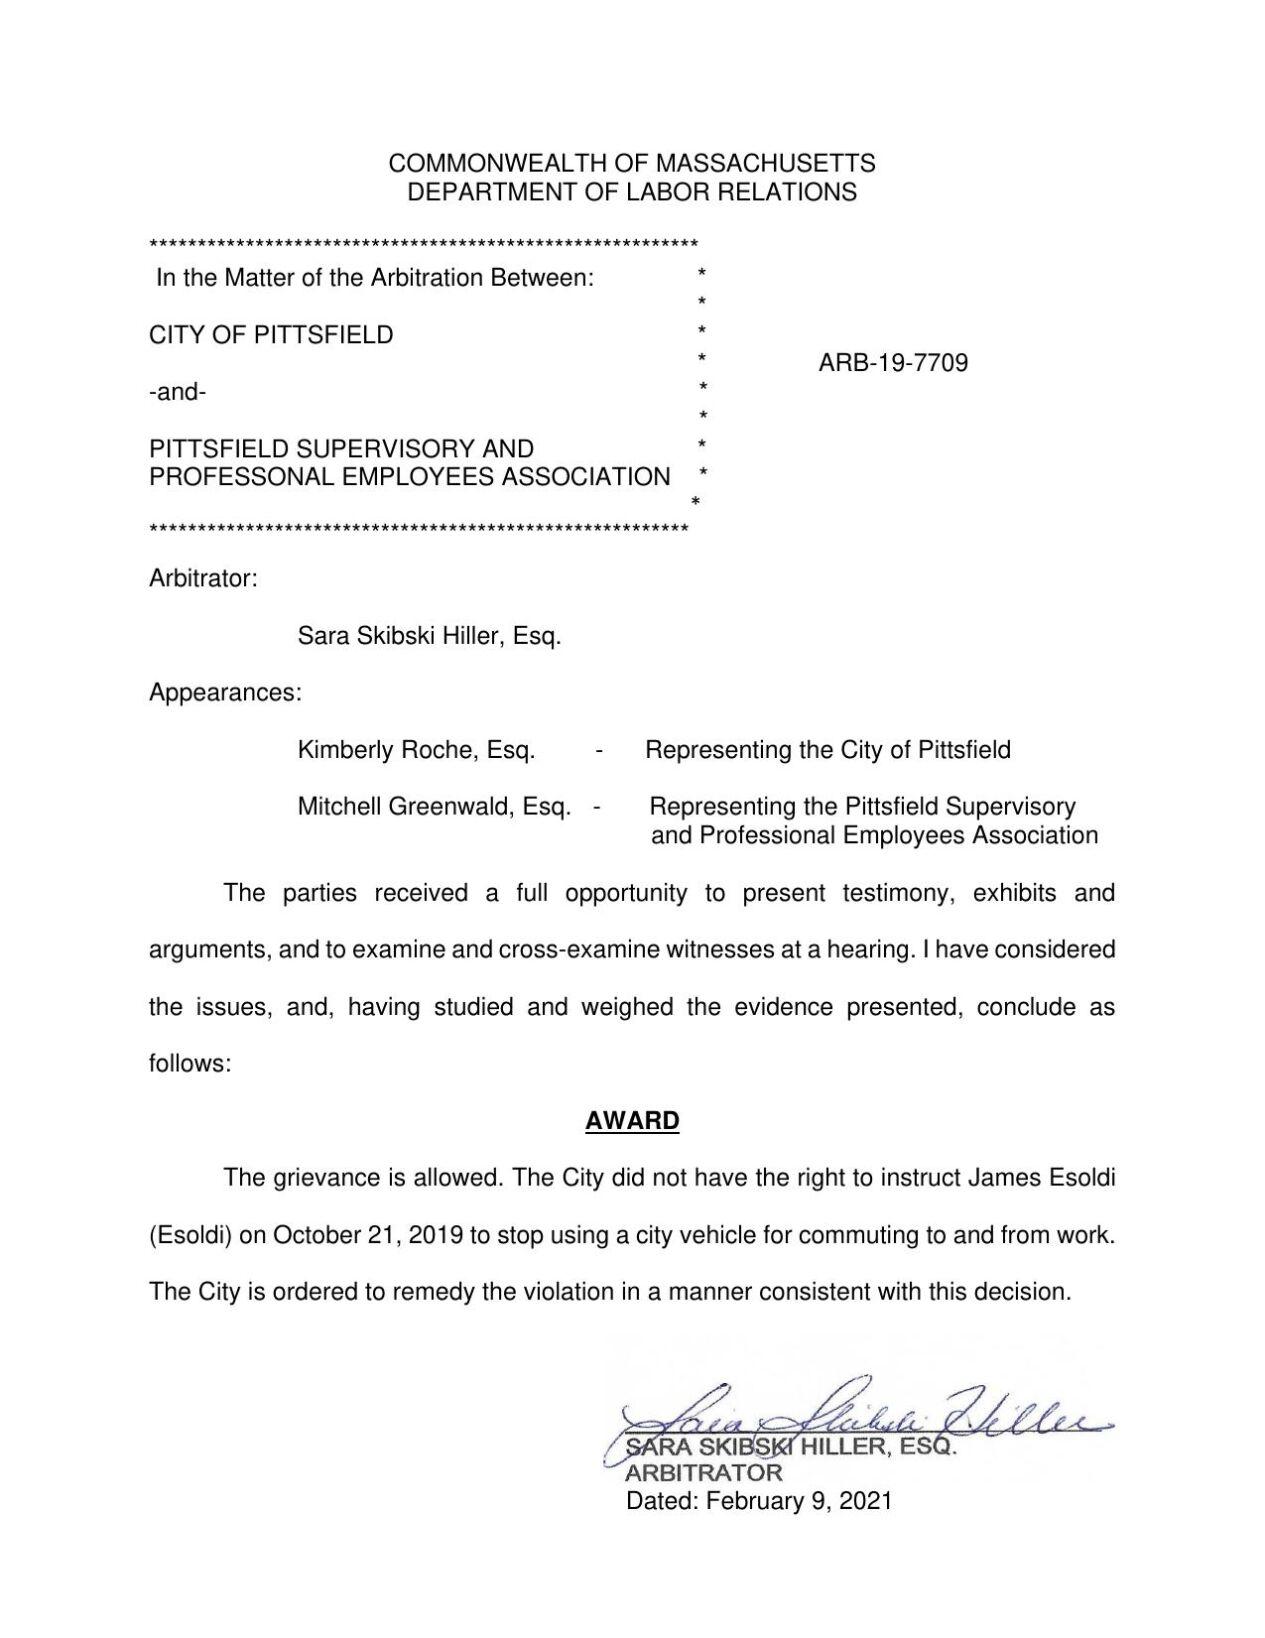 Pittsfield arbitration decision 2021